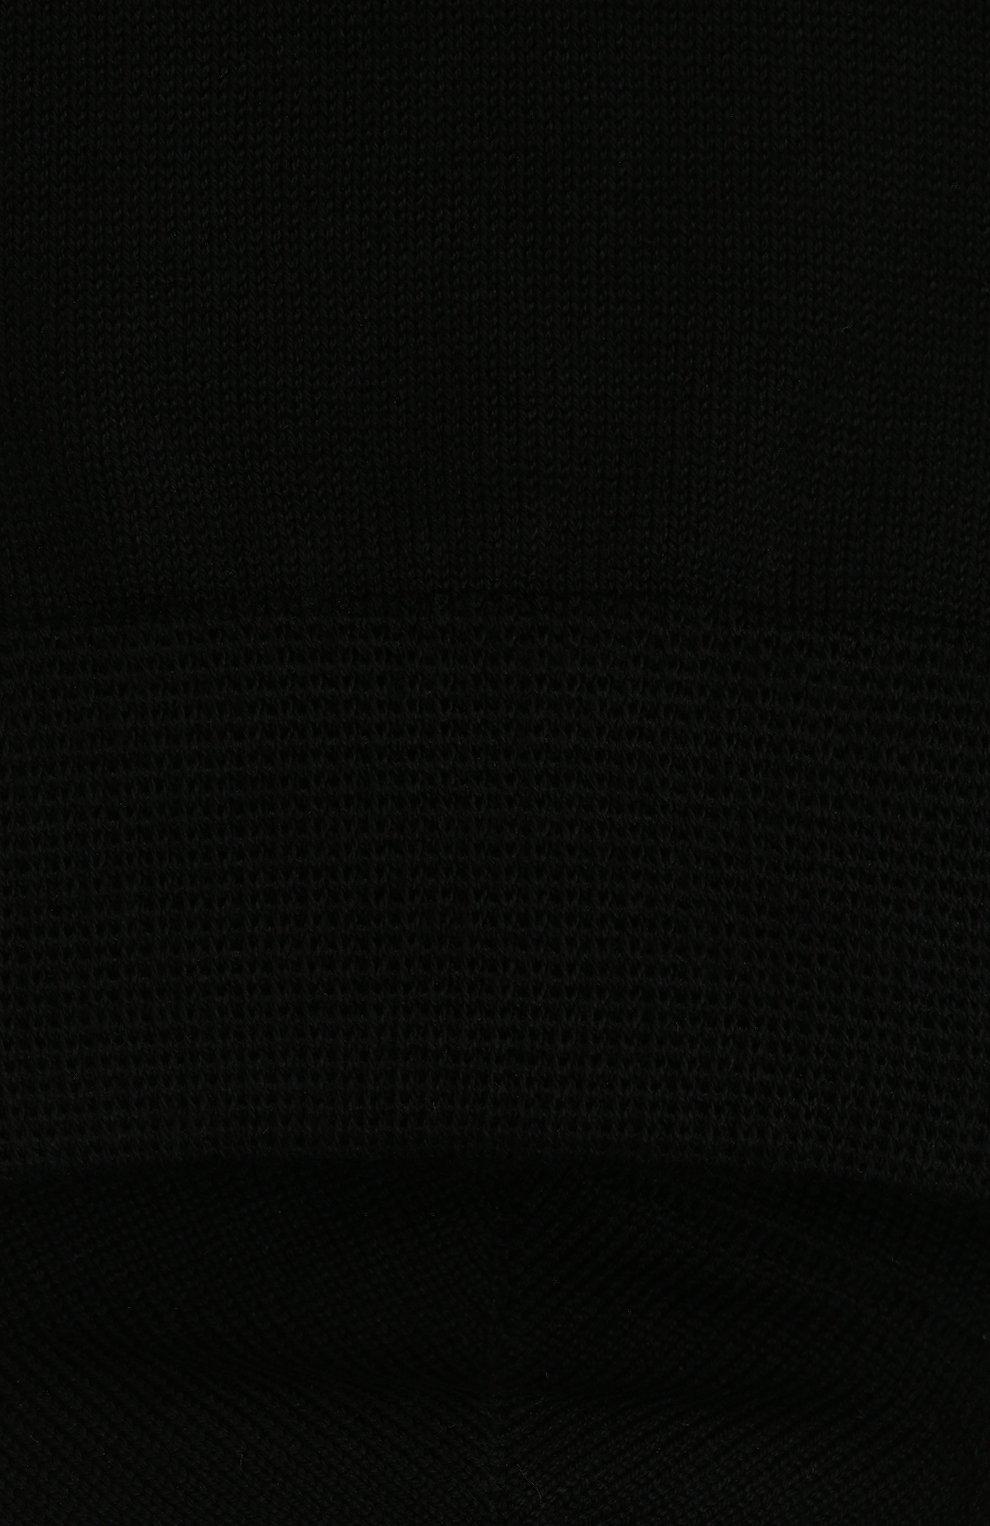 Детские носки FALKE черного цвета, арт. 10669.   Фото 2 (Материал: Текстиль, Хлопок)